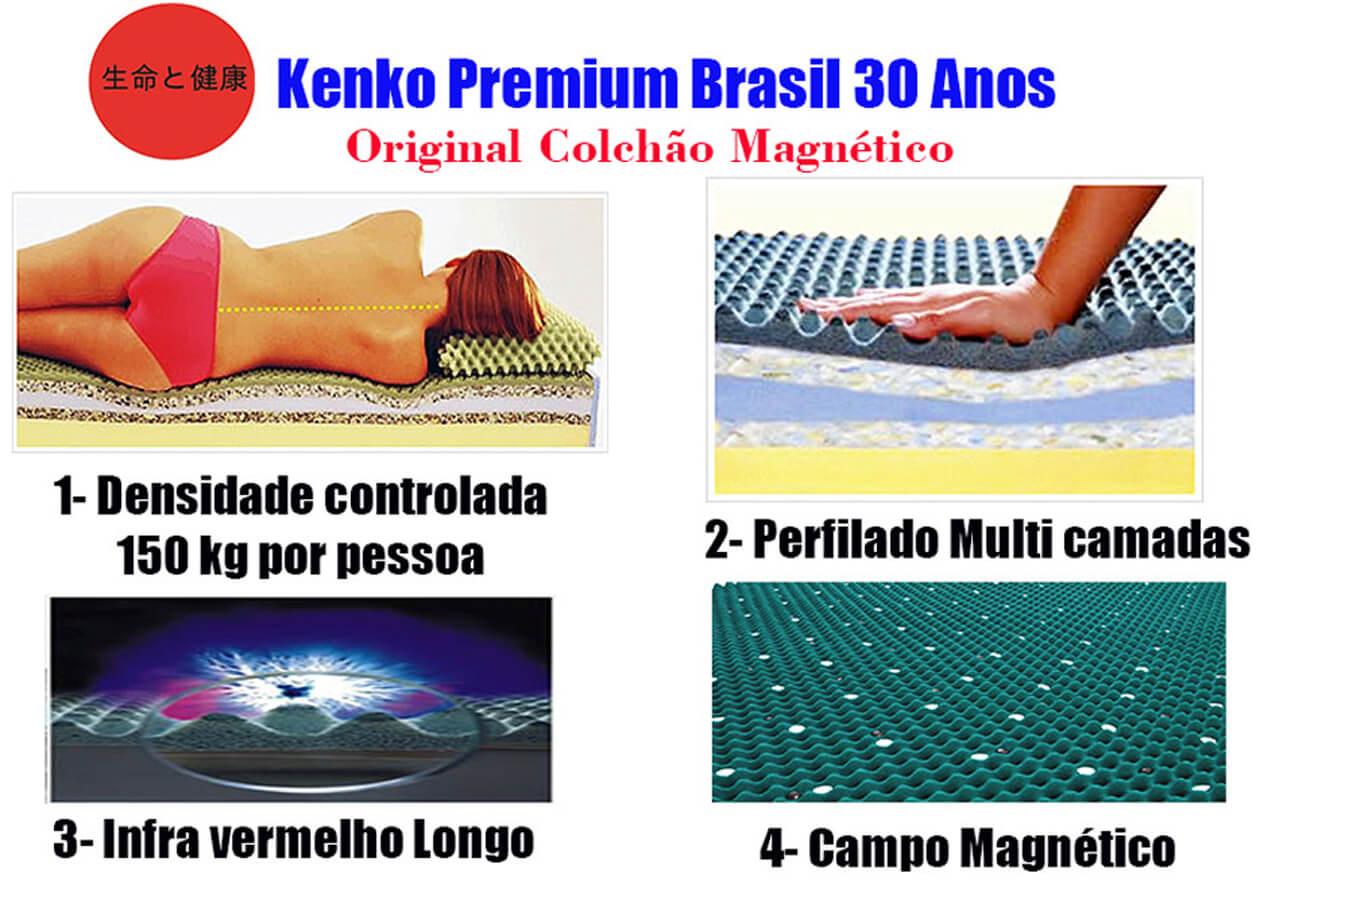 Colchão Magnético Kenko Premium, Modelo HR 29cm Látex  - Kenko Premium Colchões